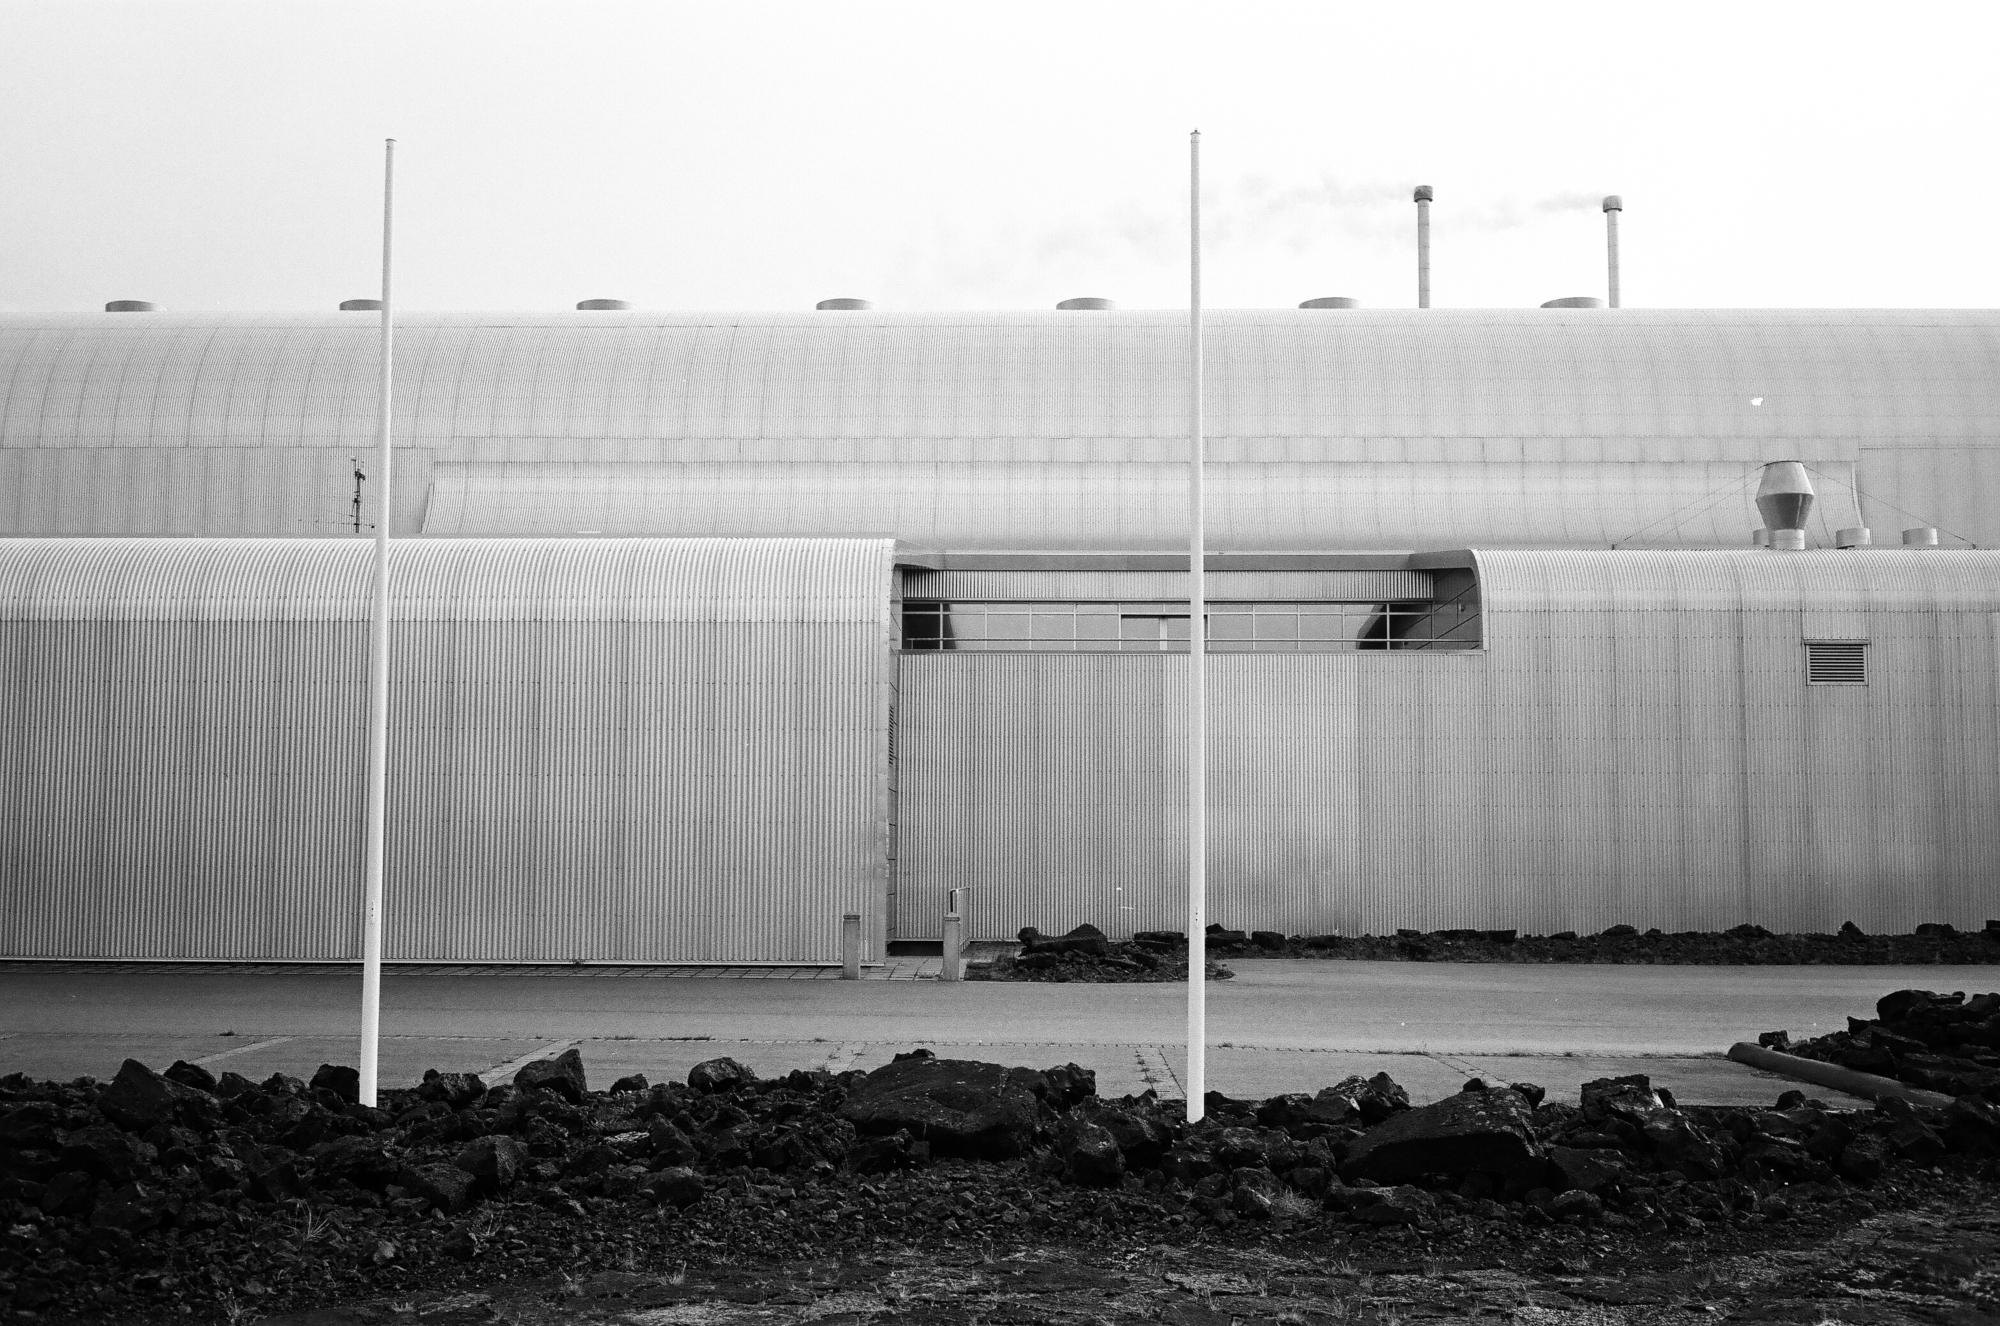 Reykjanes Geothermal Power Station